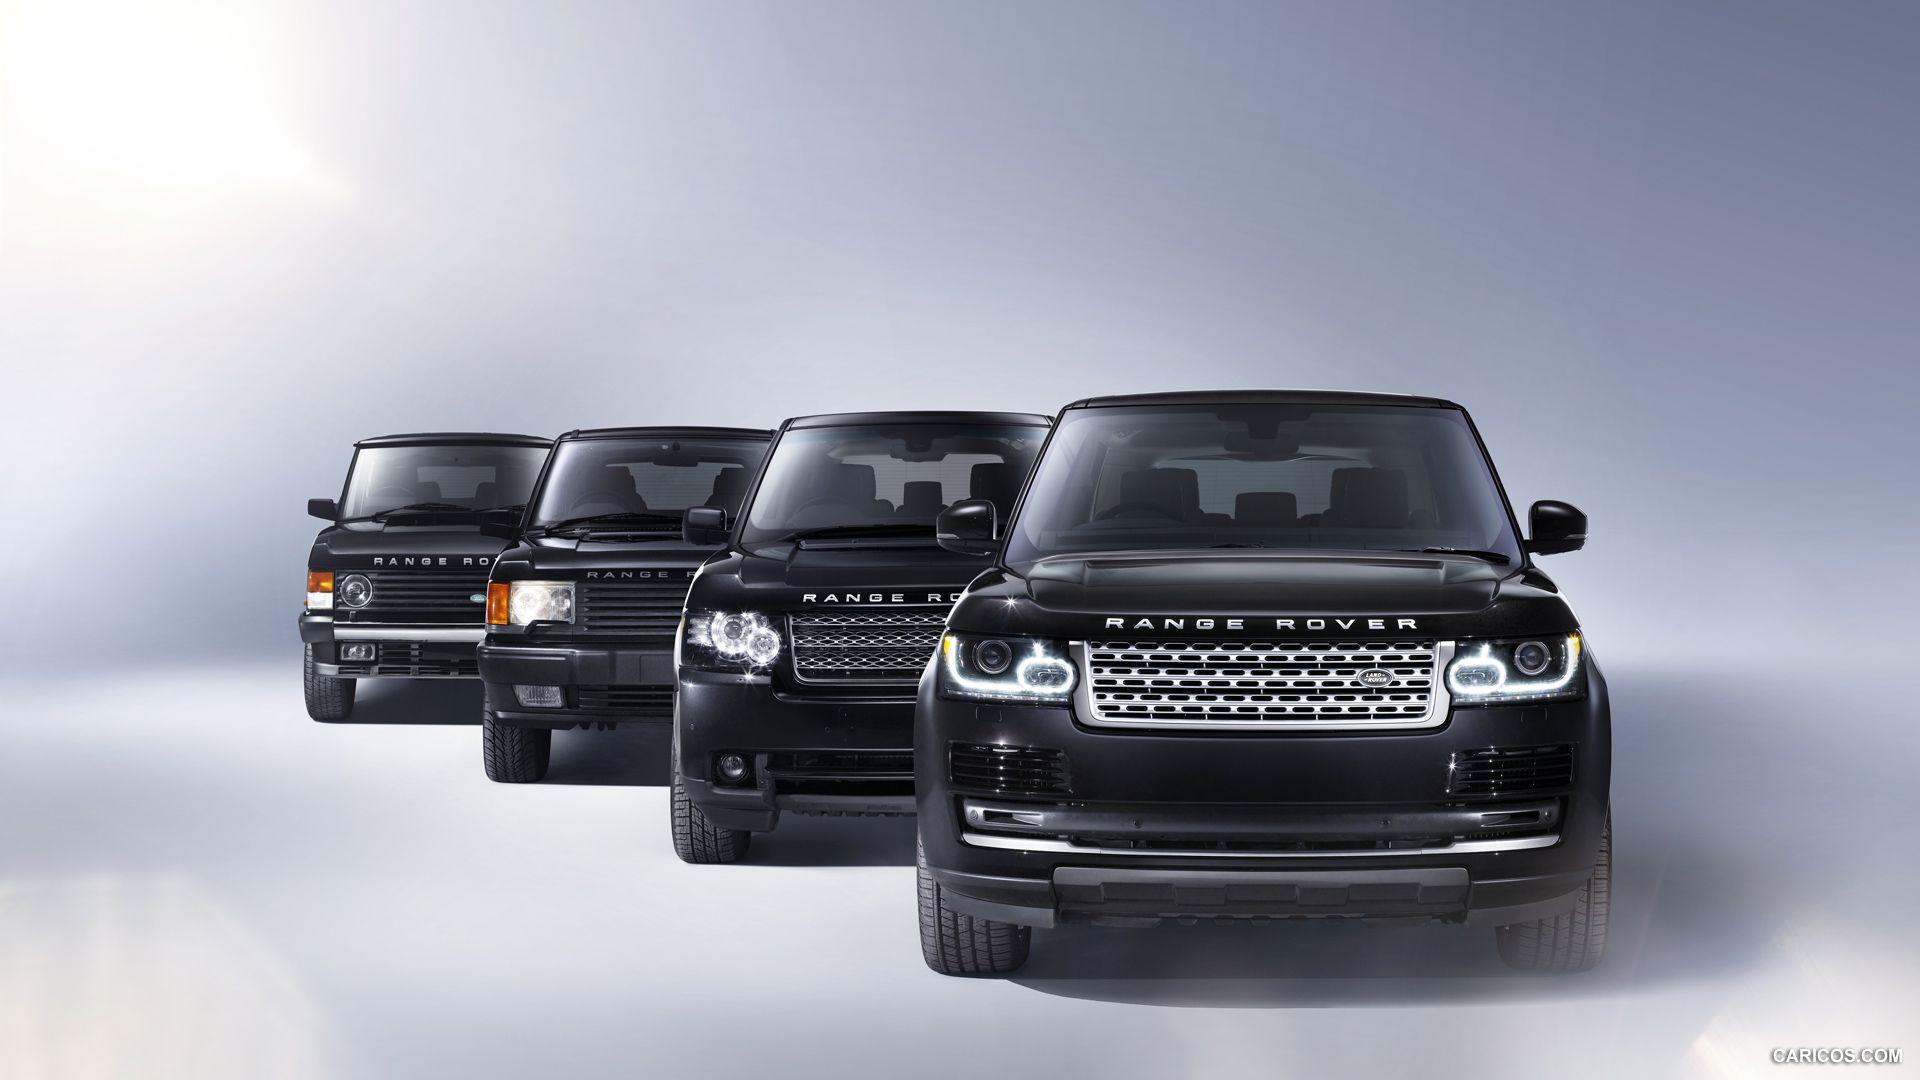 2013 Range Rover Range Rover Range Rover Supercharged Range Rover Car